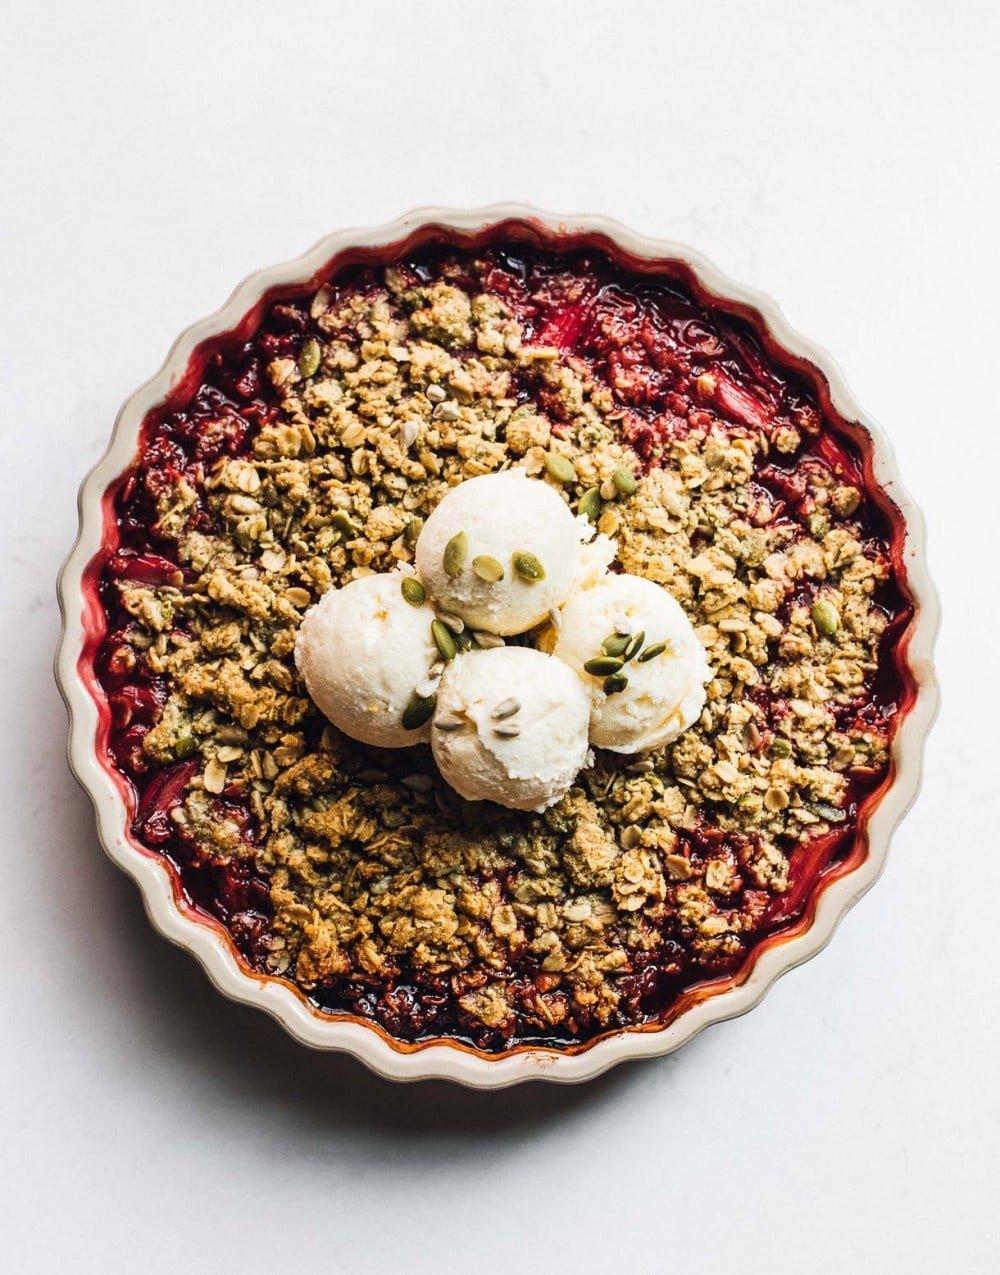 gluten free rhubarb crisp with vanilla ice cream